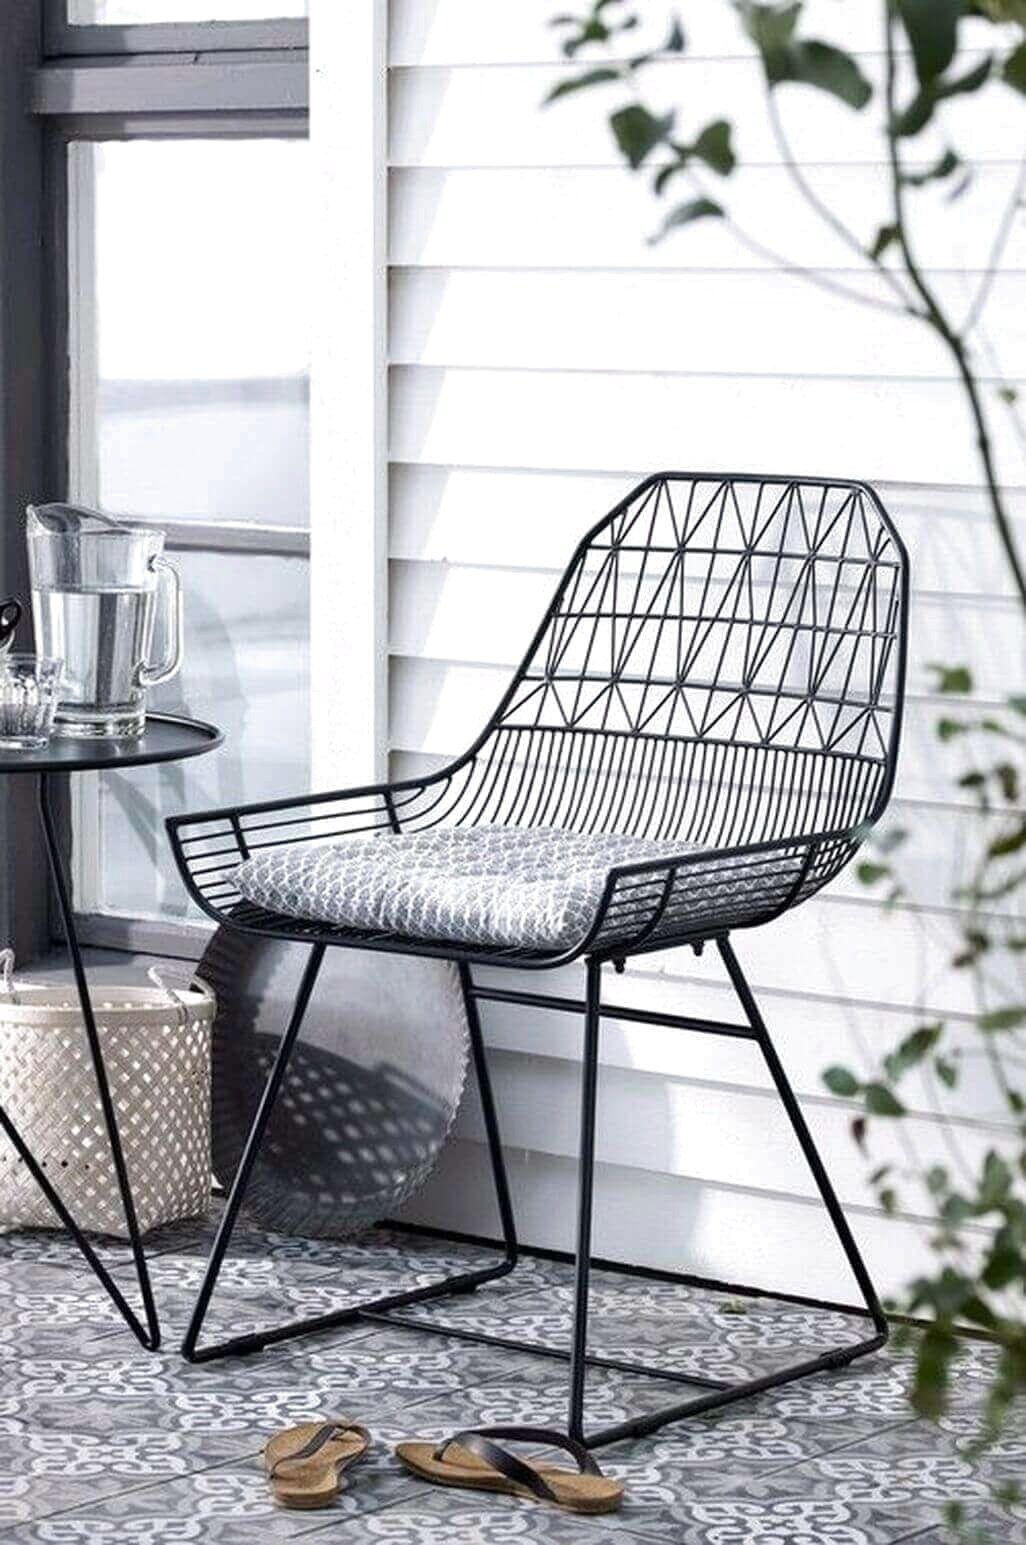 White metal patio chairs Cheap White Metal Patio Chairs Foter Emu Patio Chairs Ideas On Foter